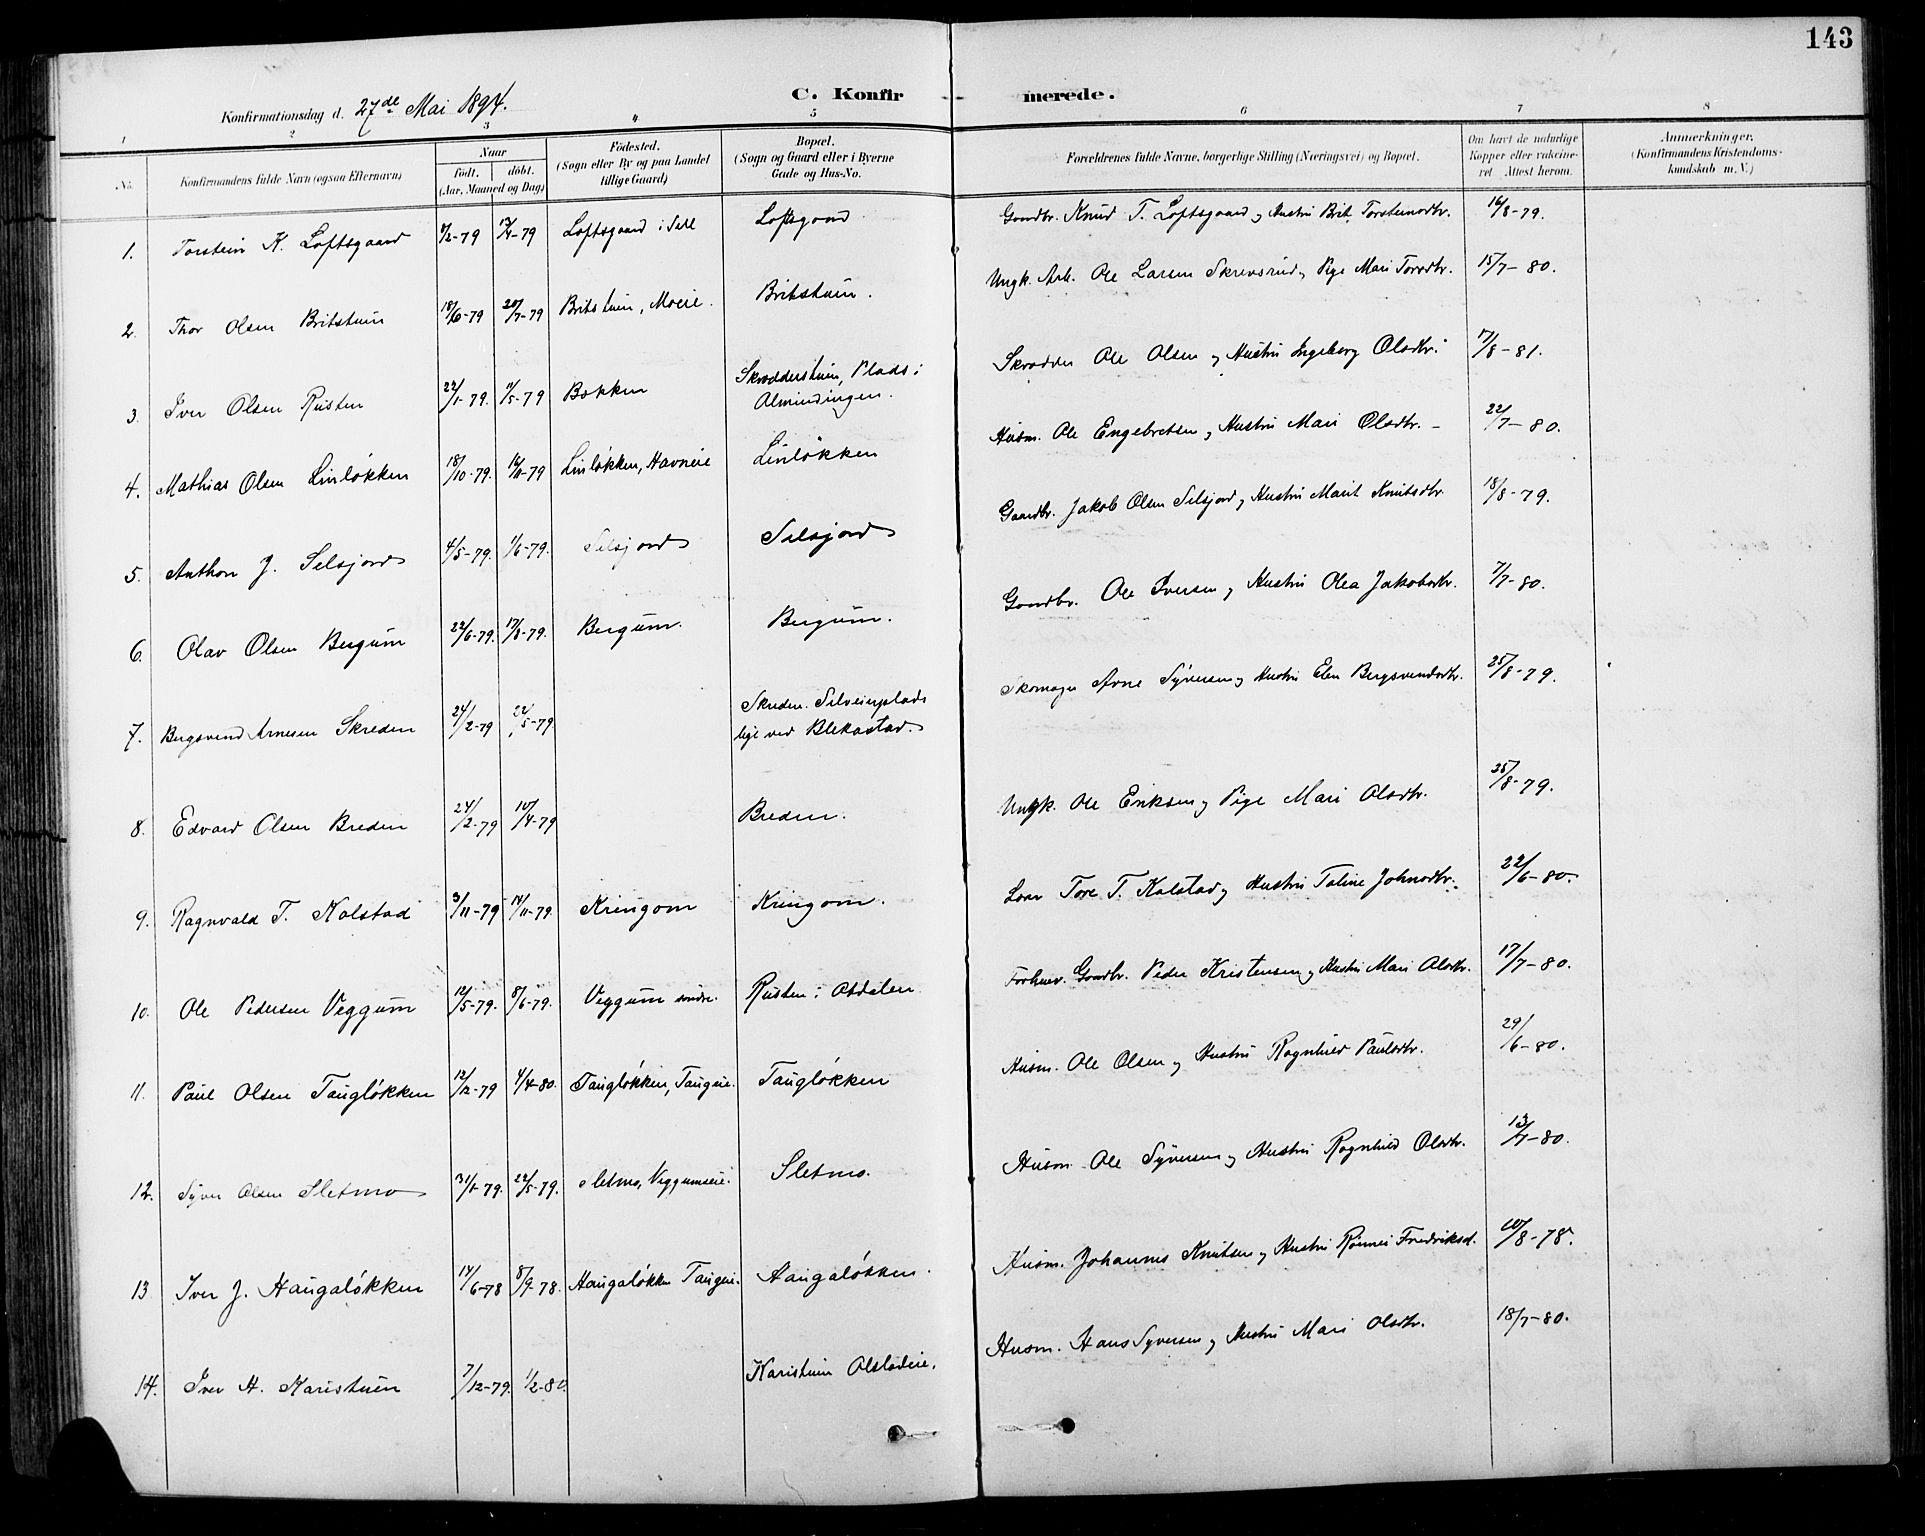 SAH, Sel prestekontor, Klokkerbok nr. 1, 1894-1923, s. 143